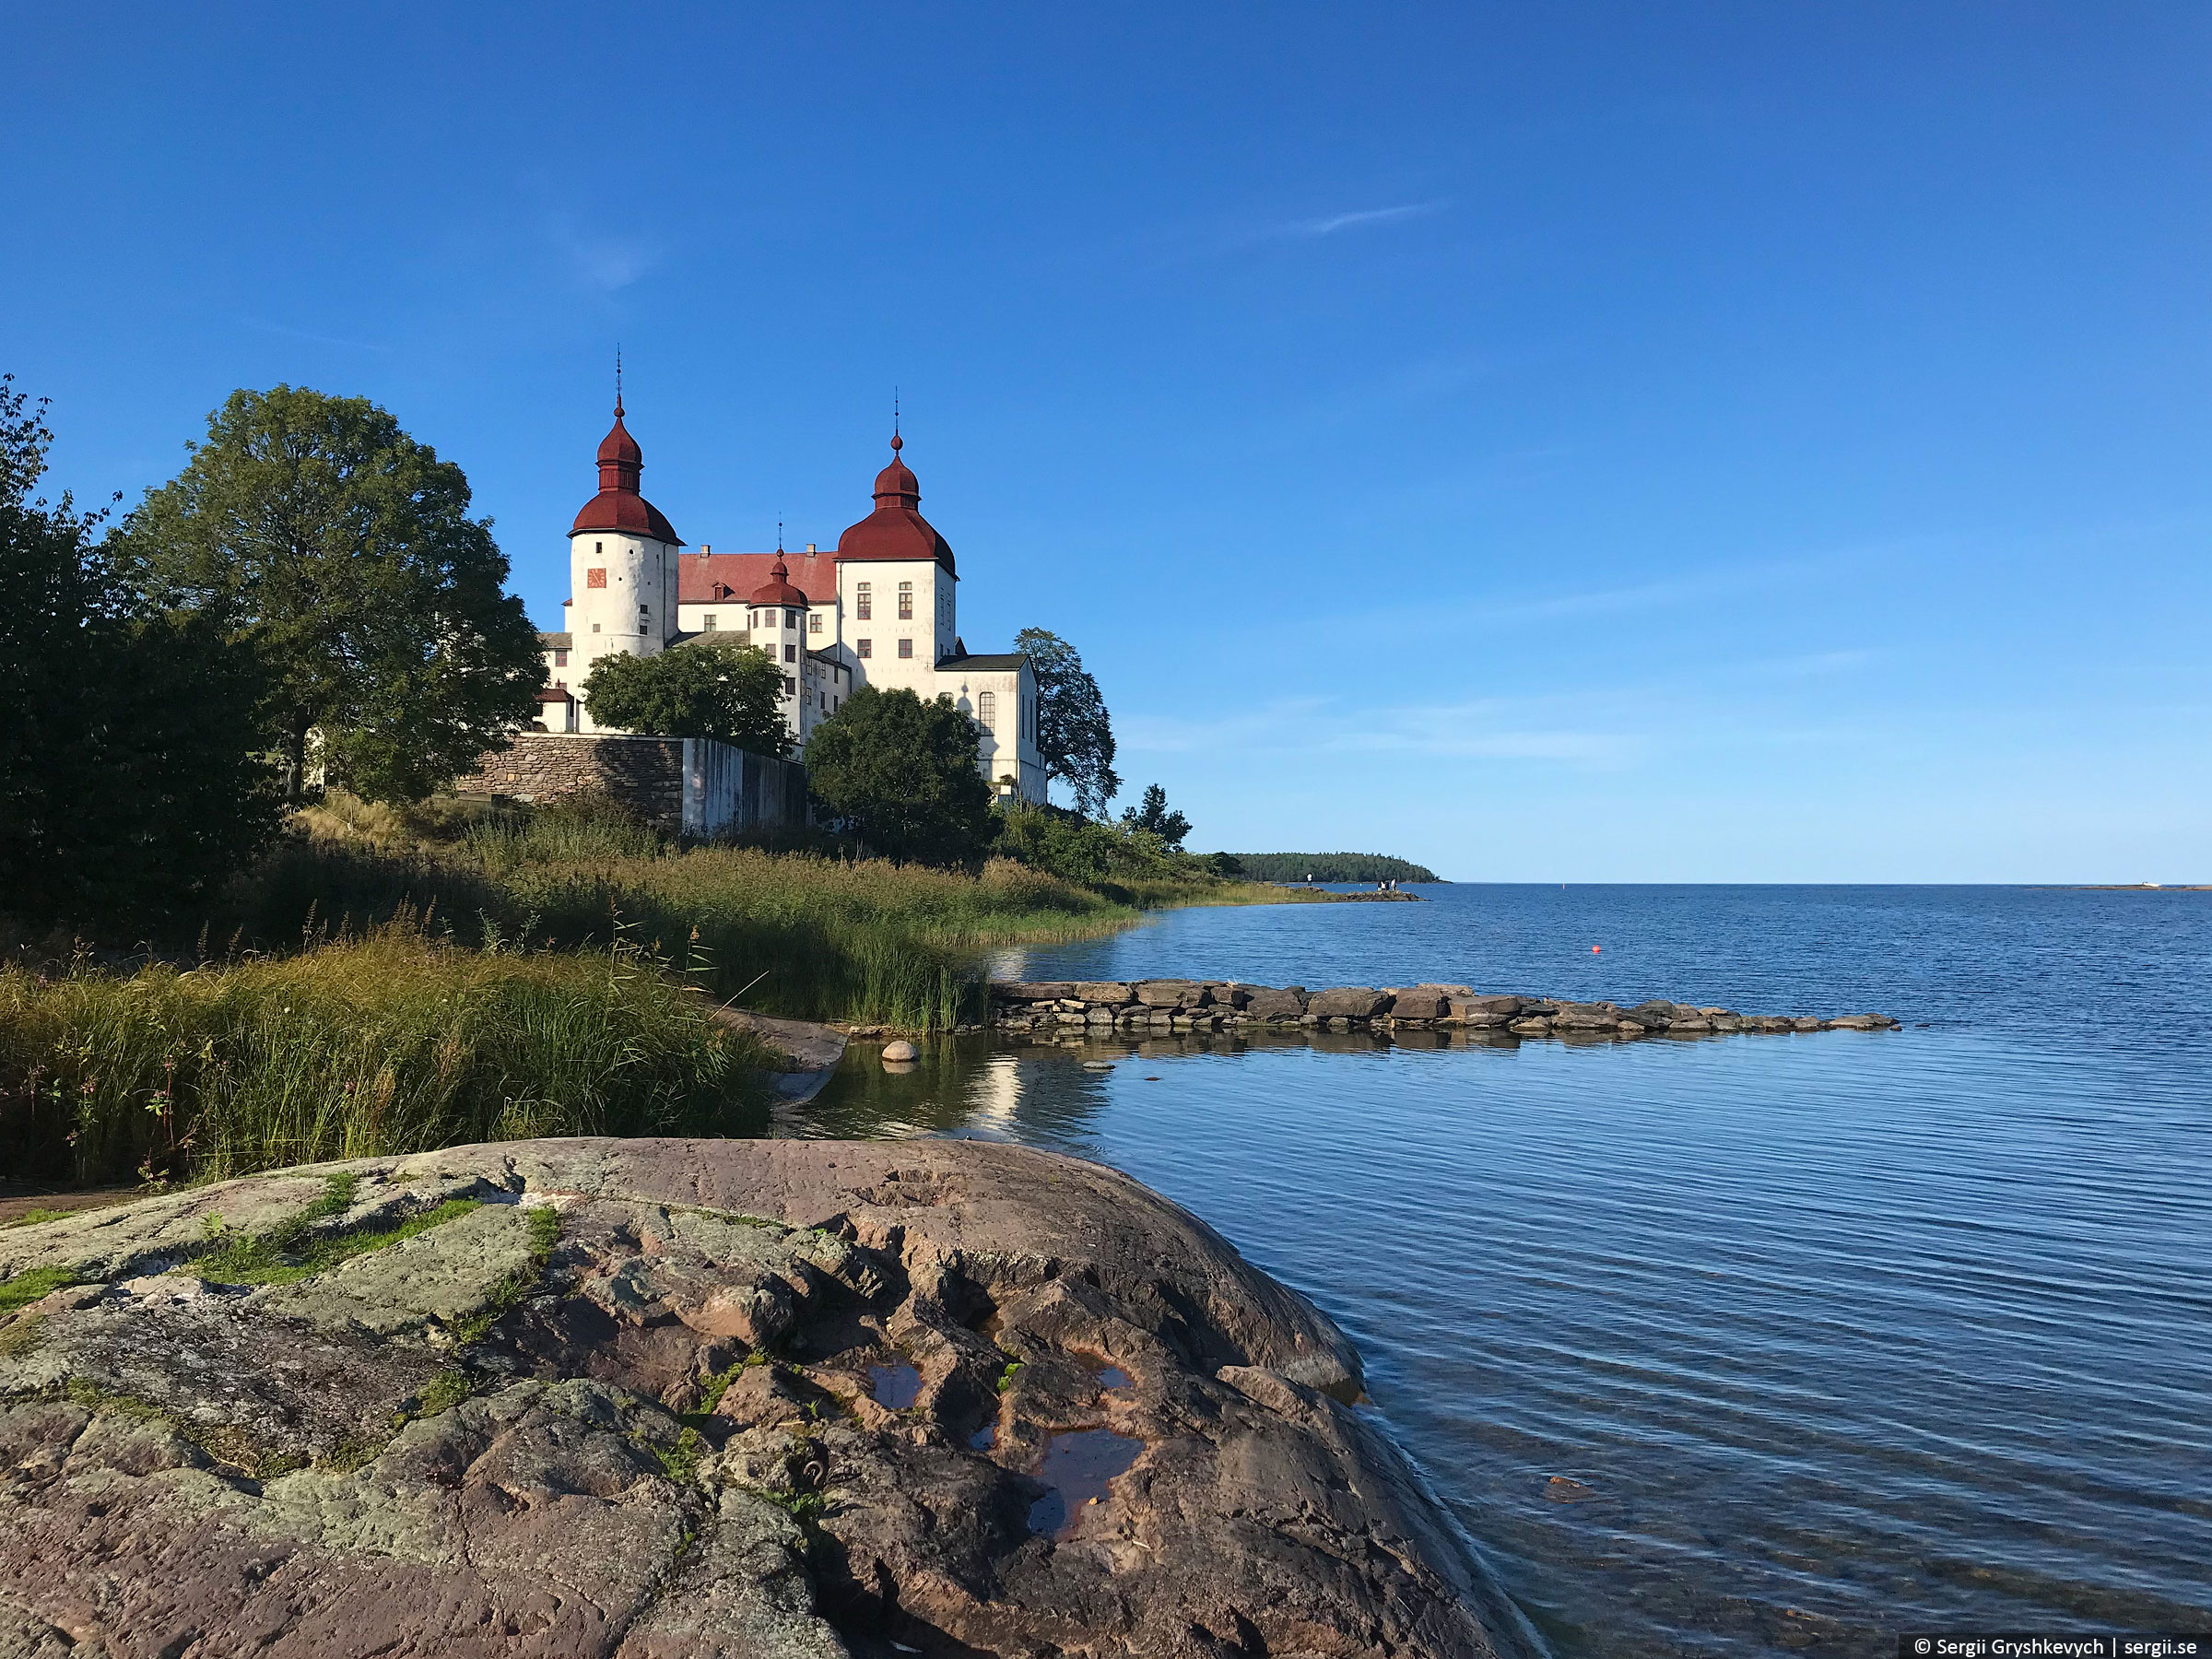 west-coast-sweden-2018-55